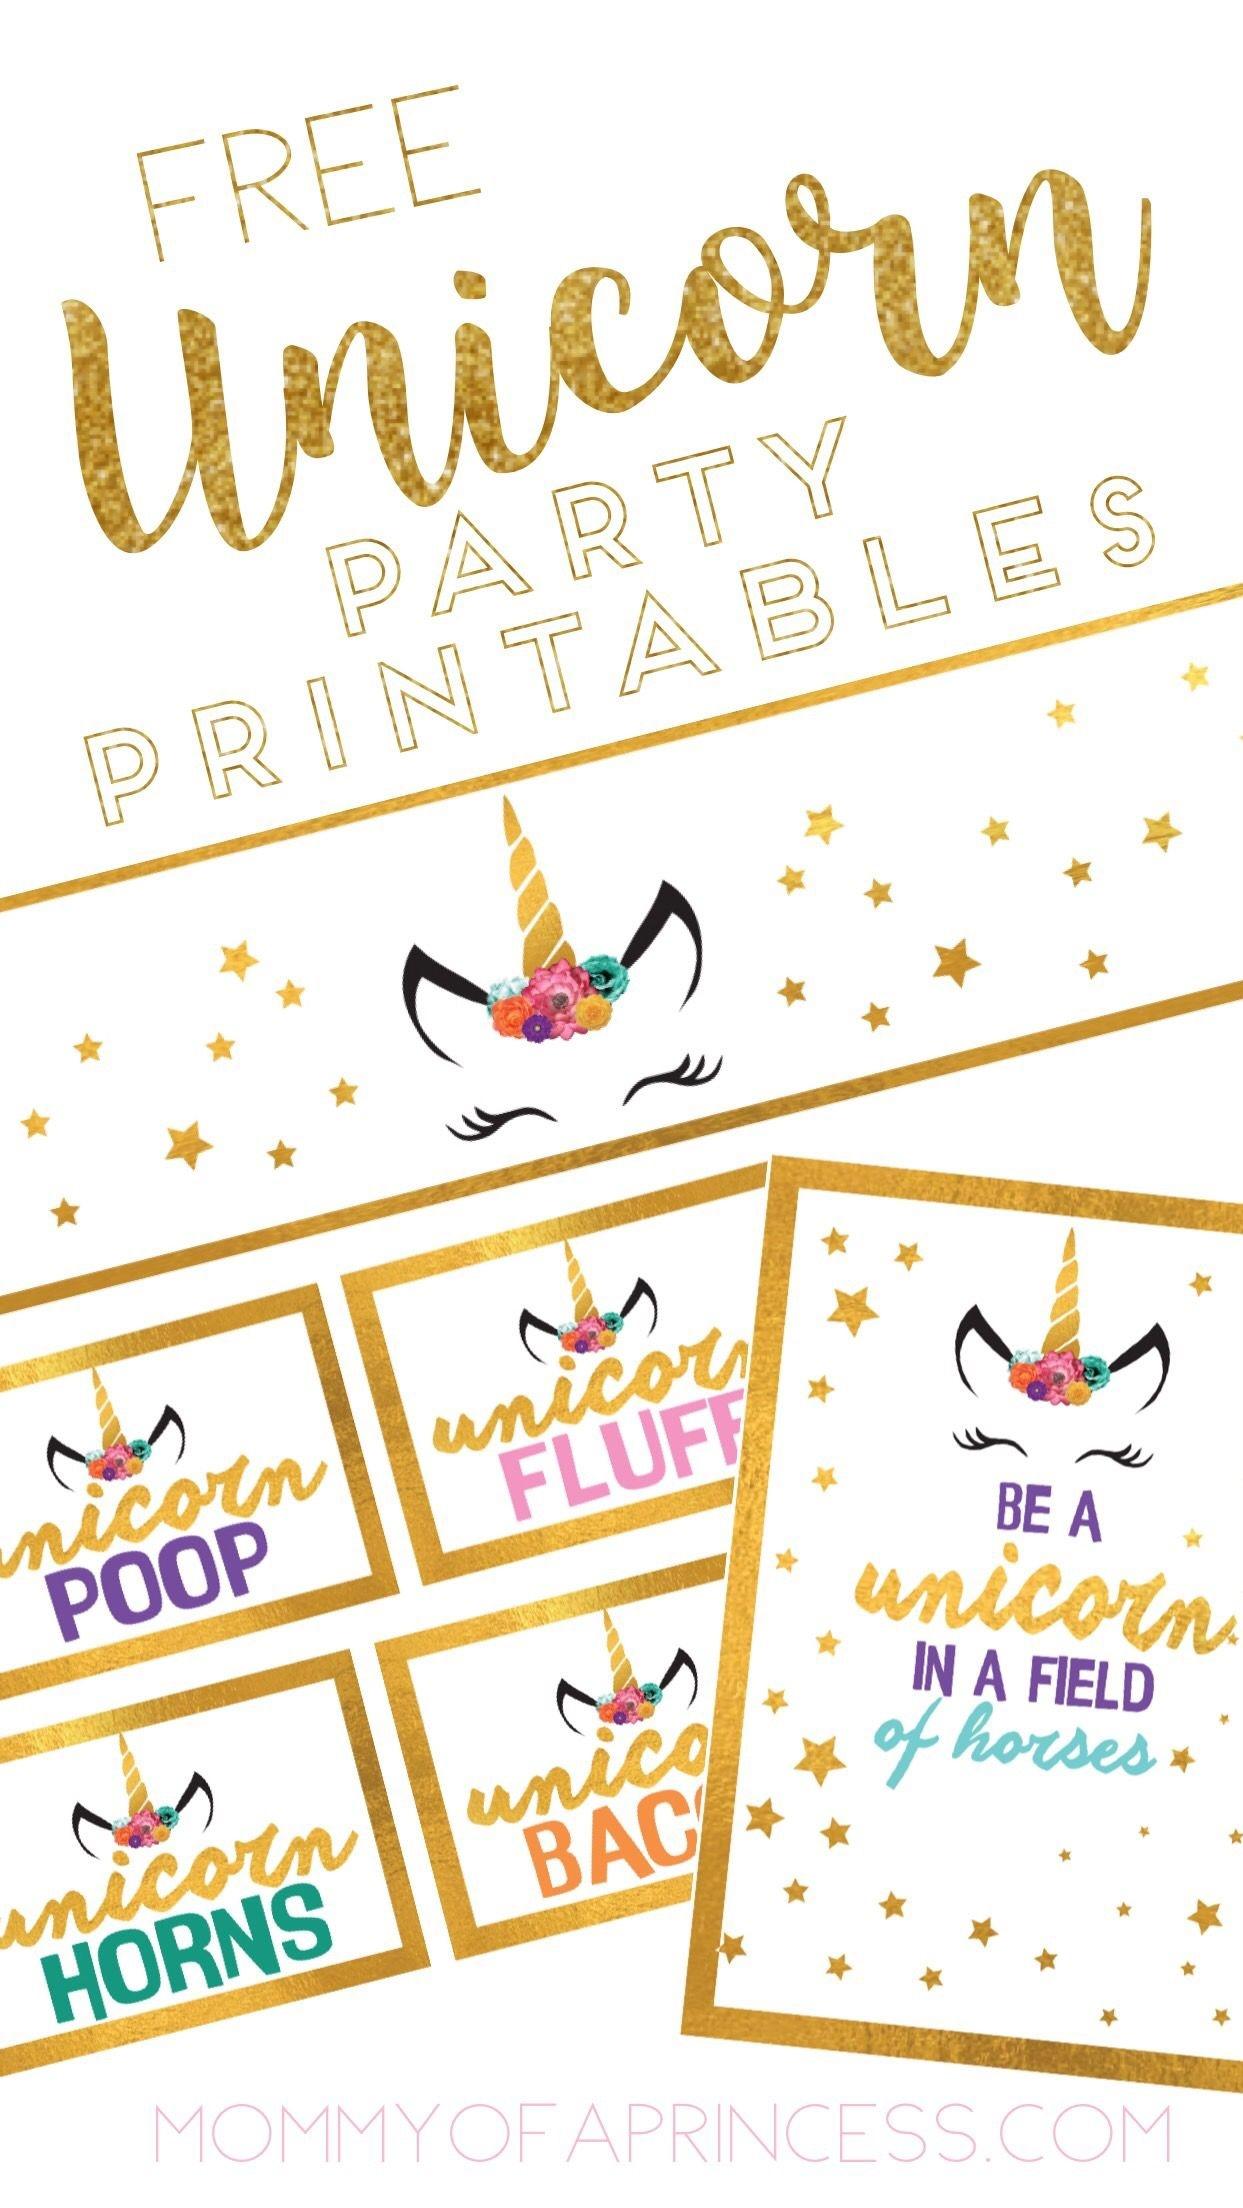 Unicorn Birthday Party Ideas With Free Printable Download | Feestje - Free Unicorn Birthday Printables